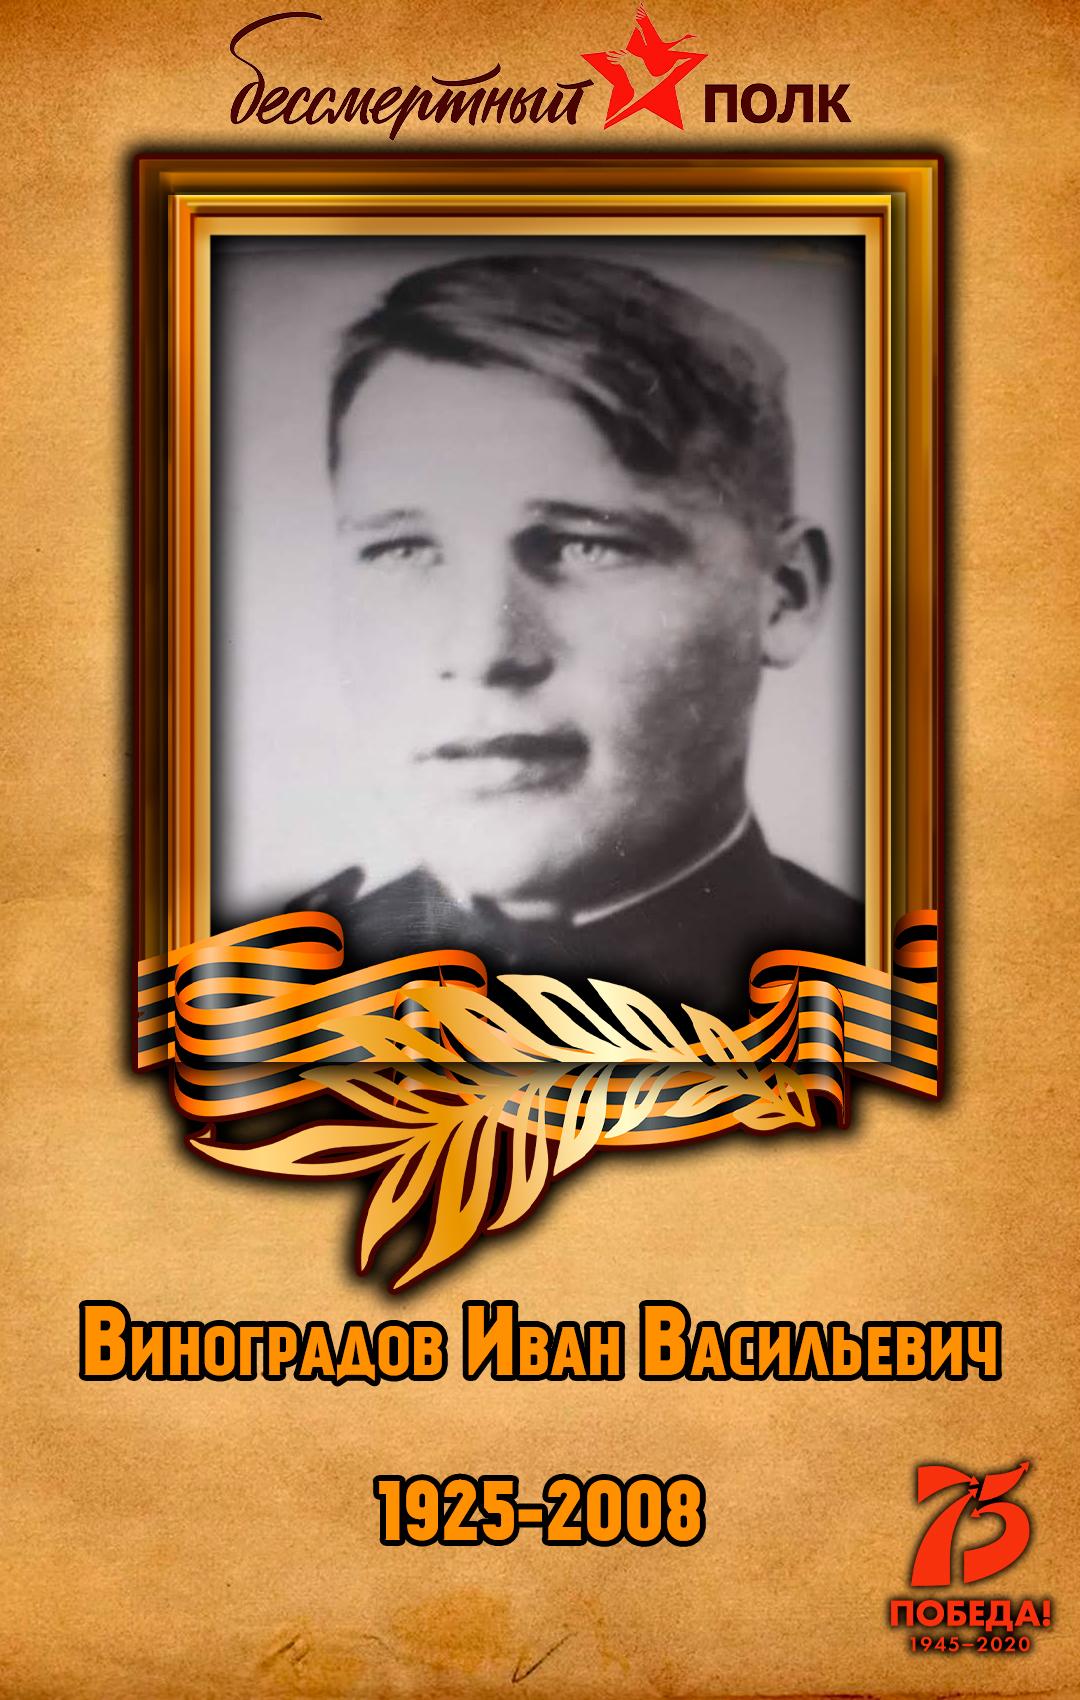 Виноградов-Иван-Васильевич